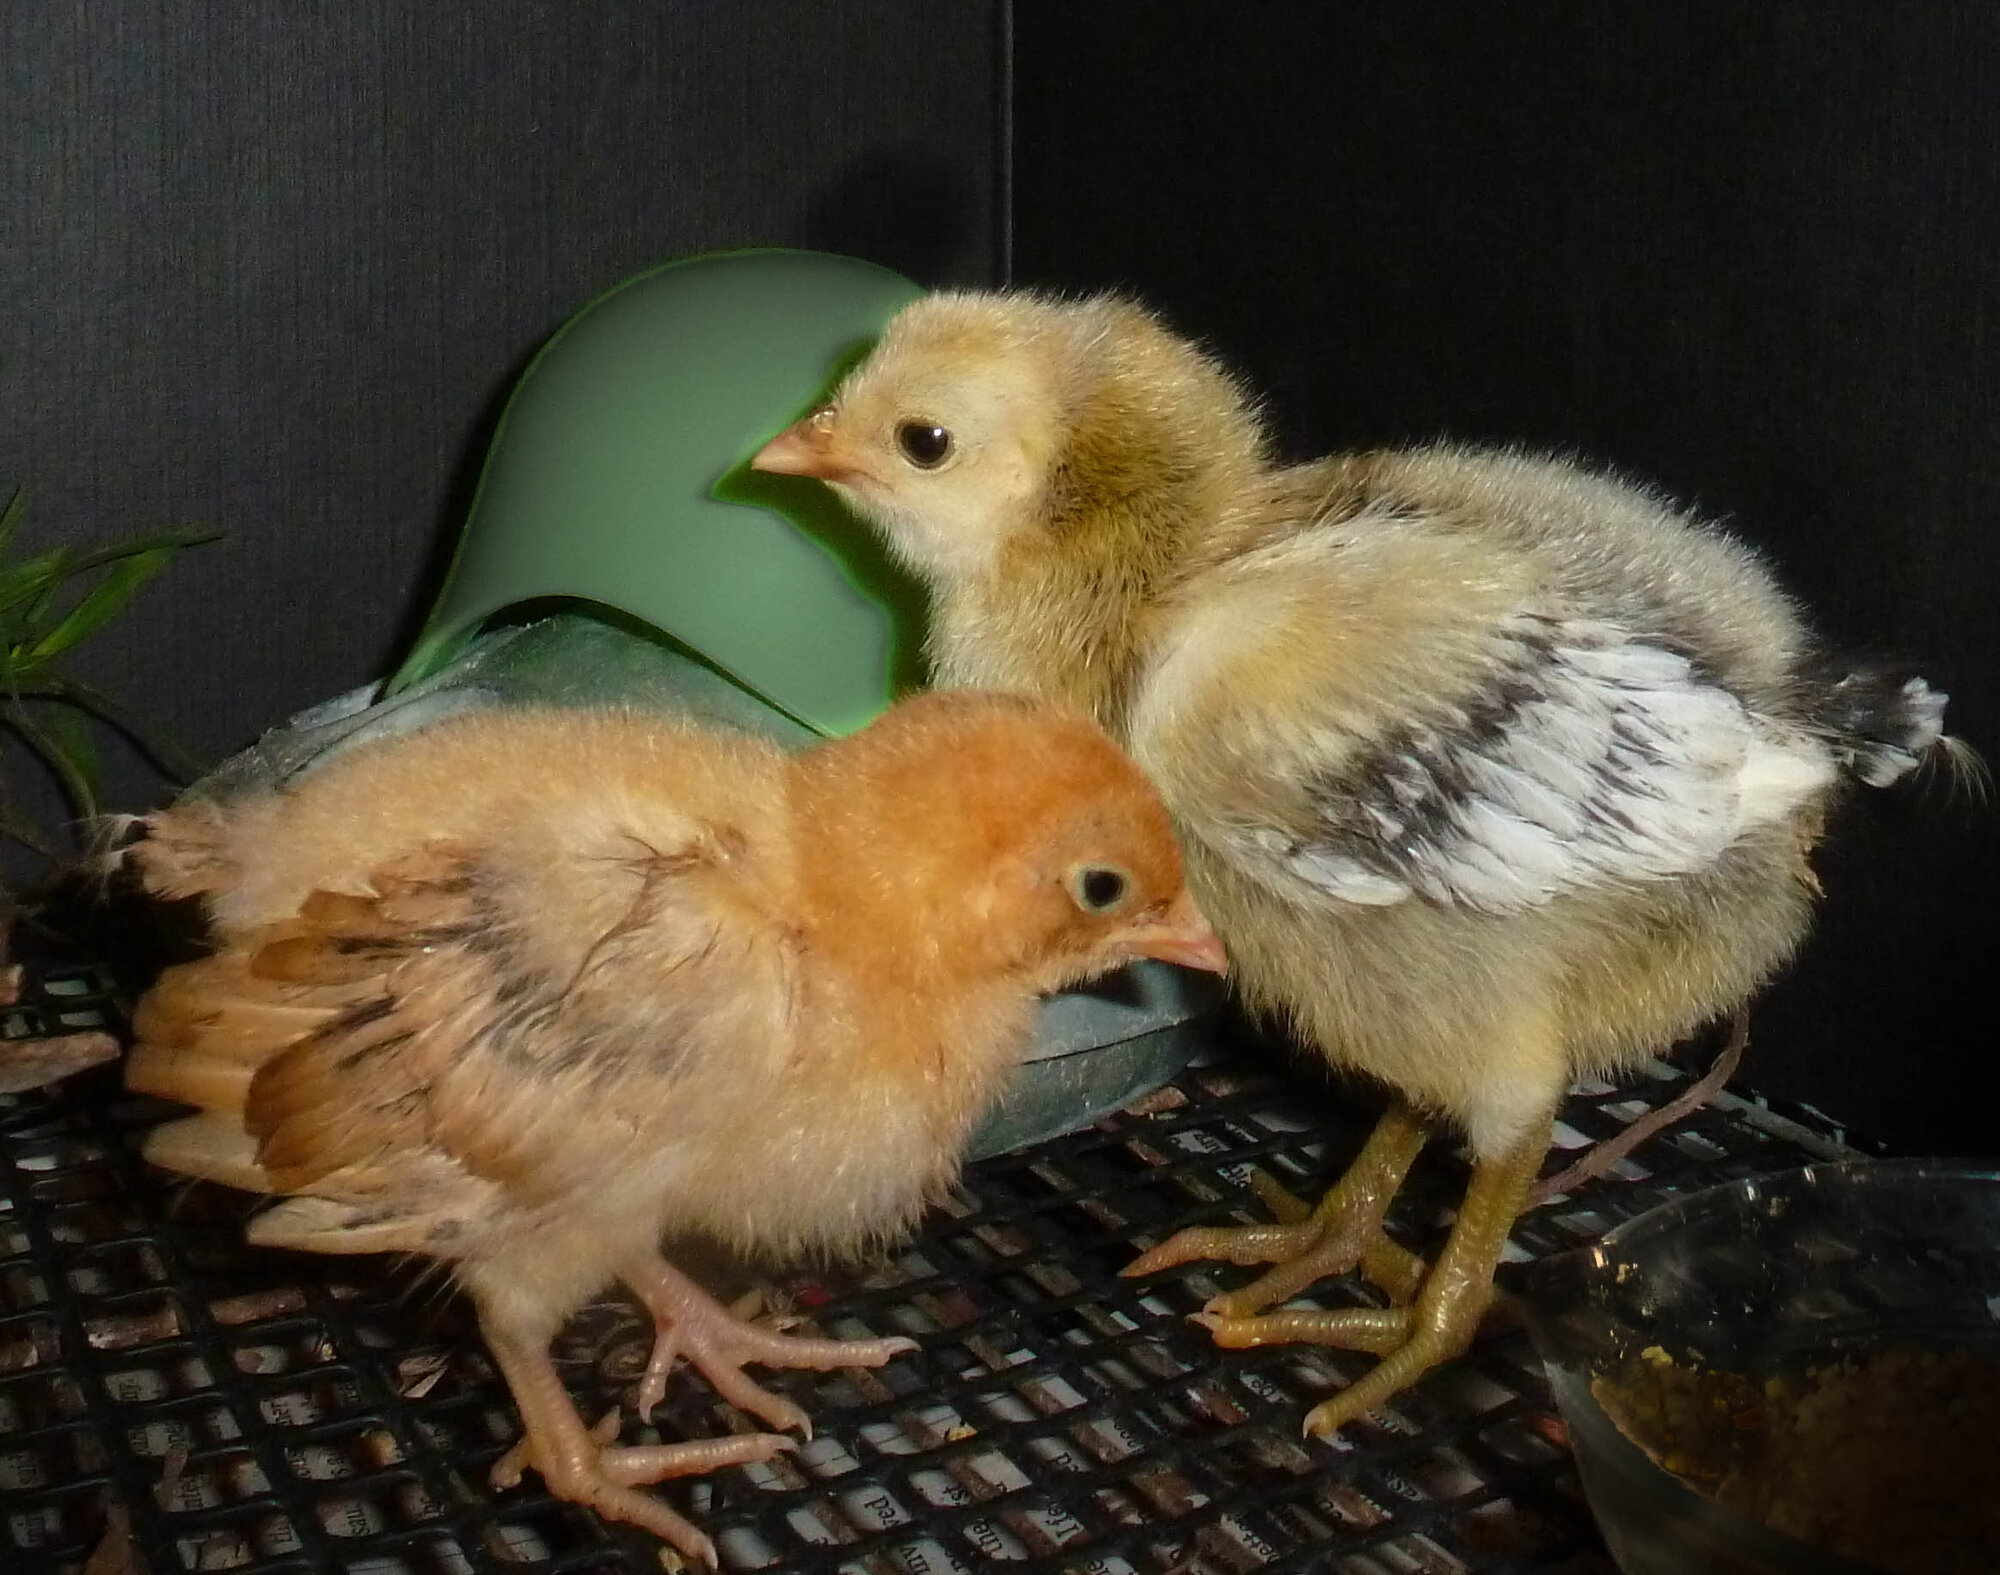 6-21 brooder chicks_.jpg